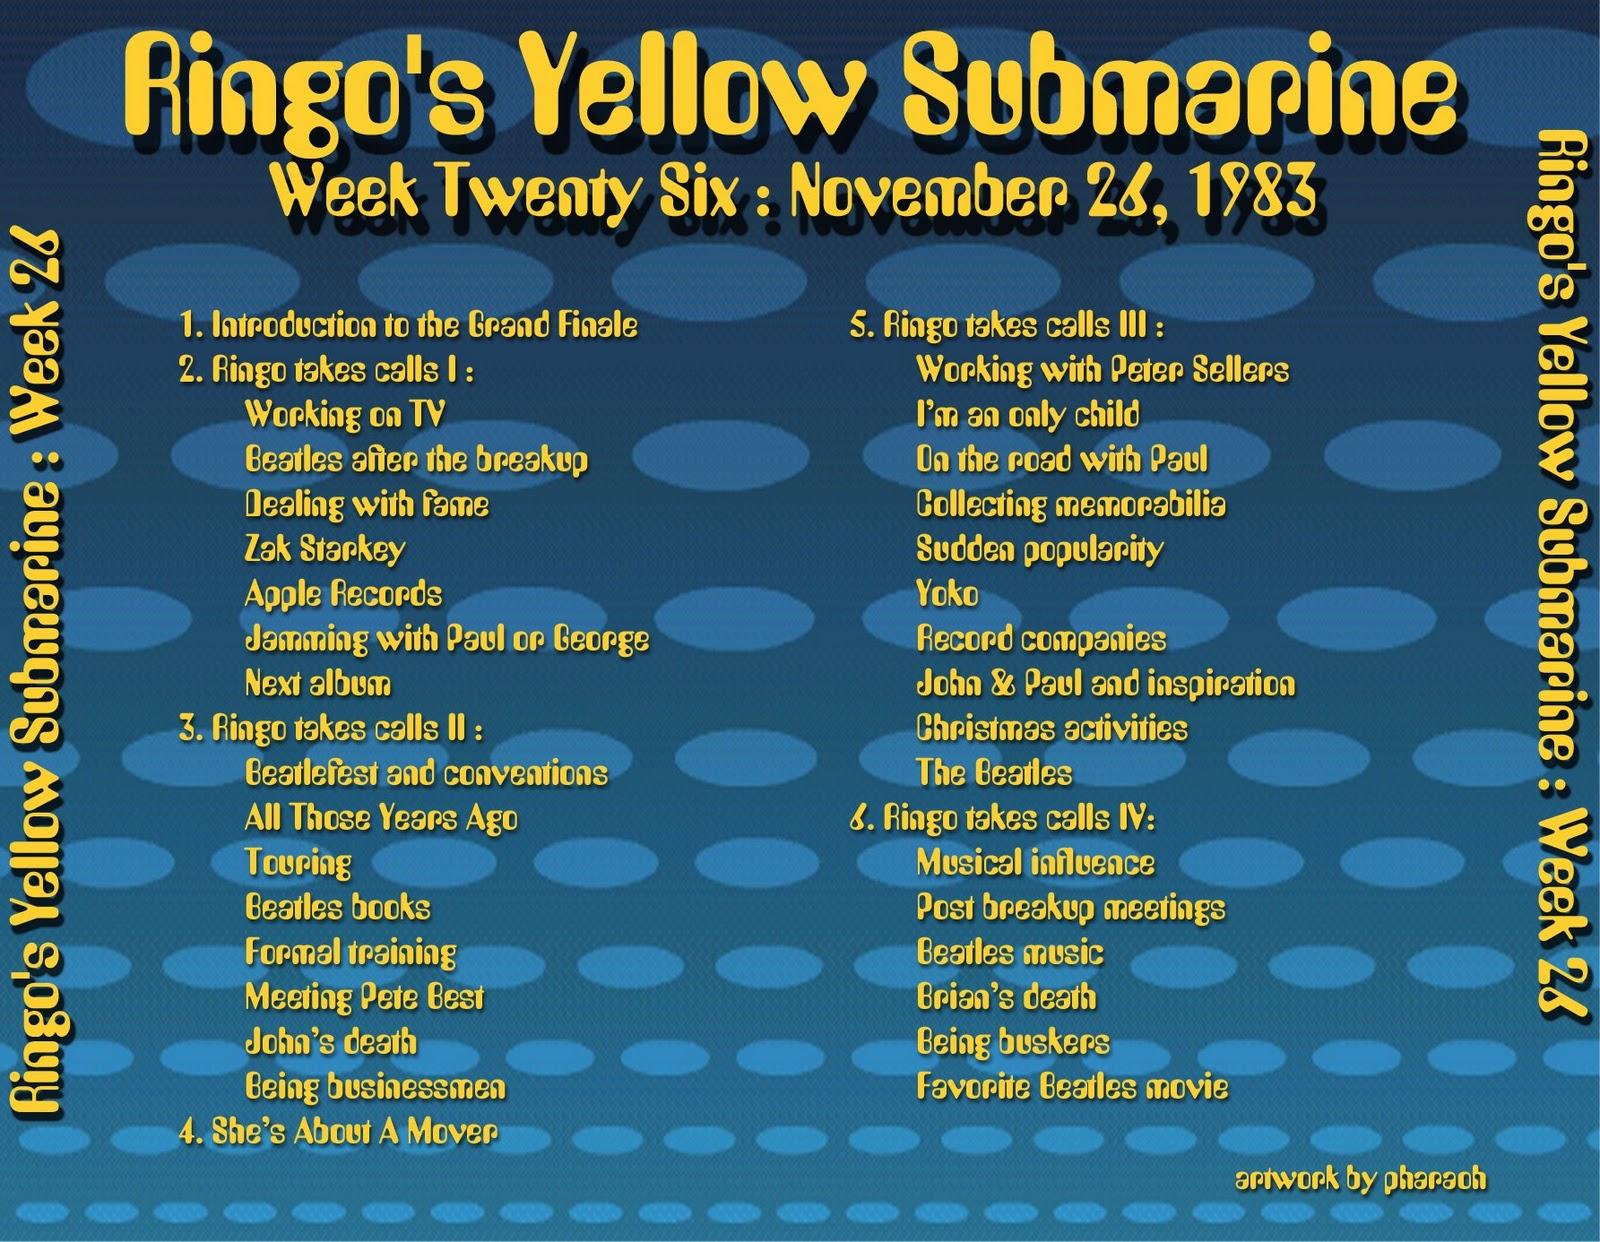 Beatles Radio Waves: 1983 11 26 Ringo's Yellow Submarine 26 #B69915 1600 1242